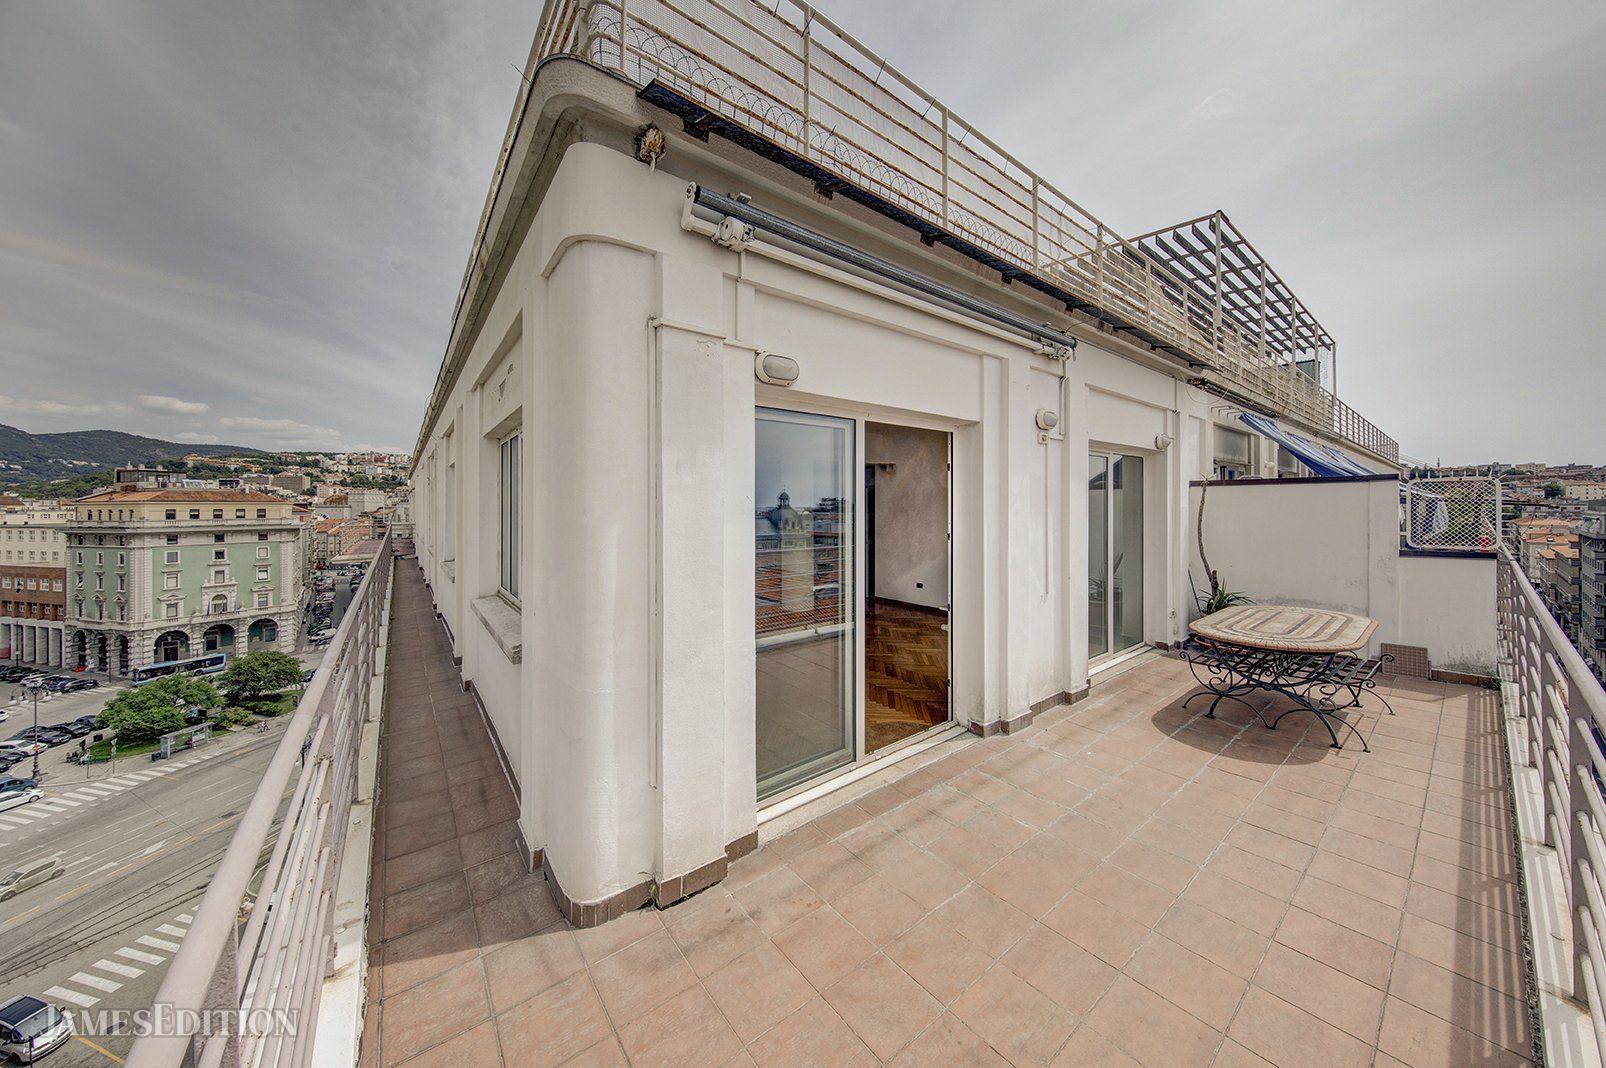 Penthouse in Trieste, Friuli-Venezia Giulia, Italy 1